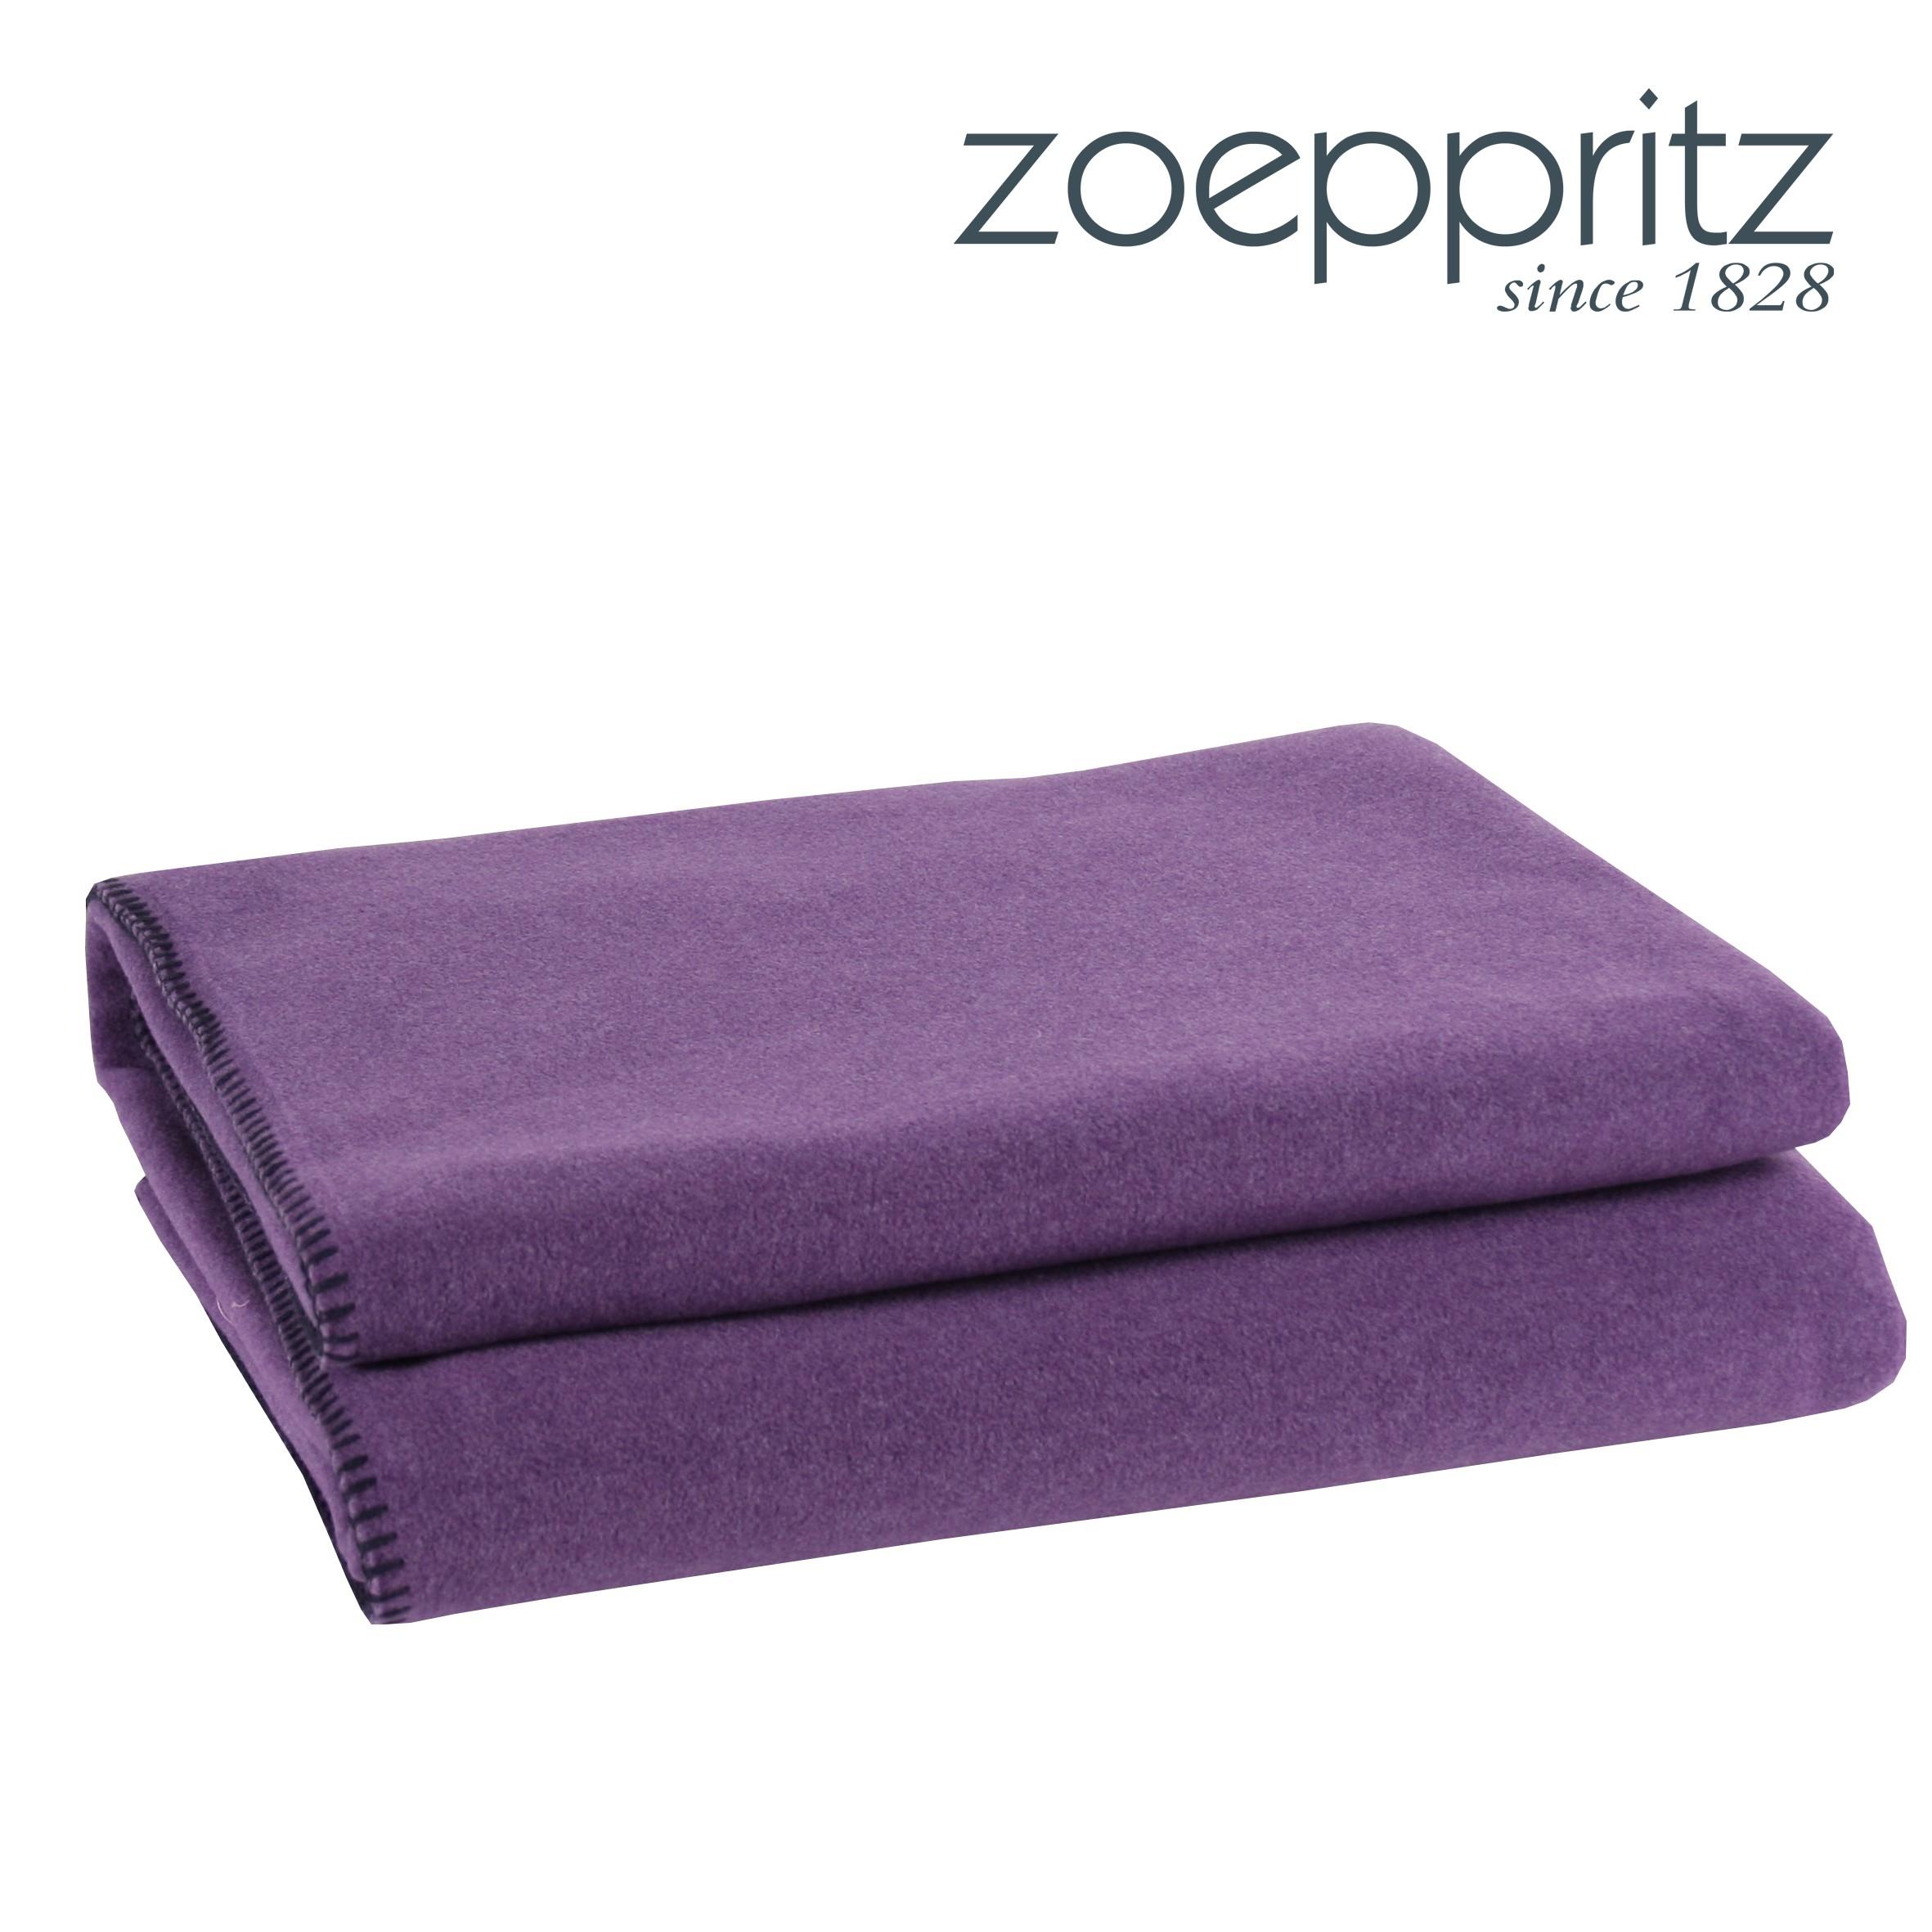 zoeppritz plaid soft fleece purple. Black Bedroom Furniture Sets. Home Design Ideas